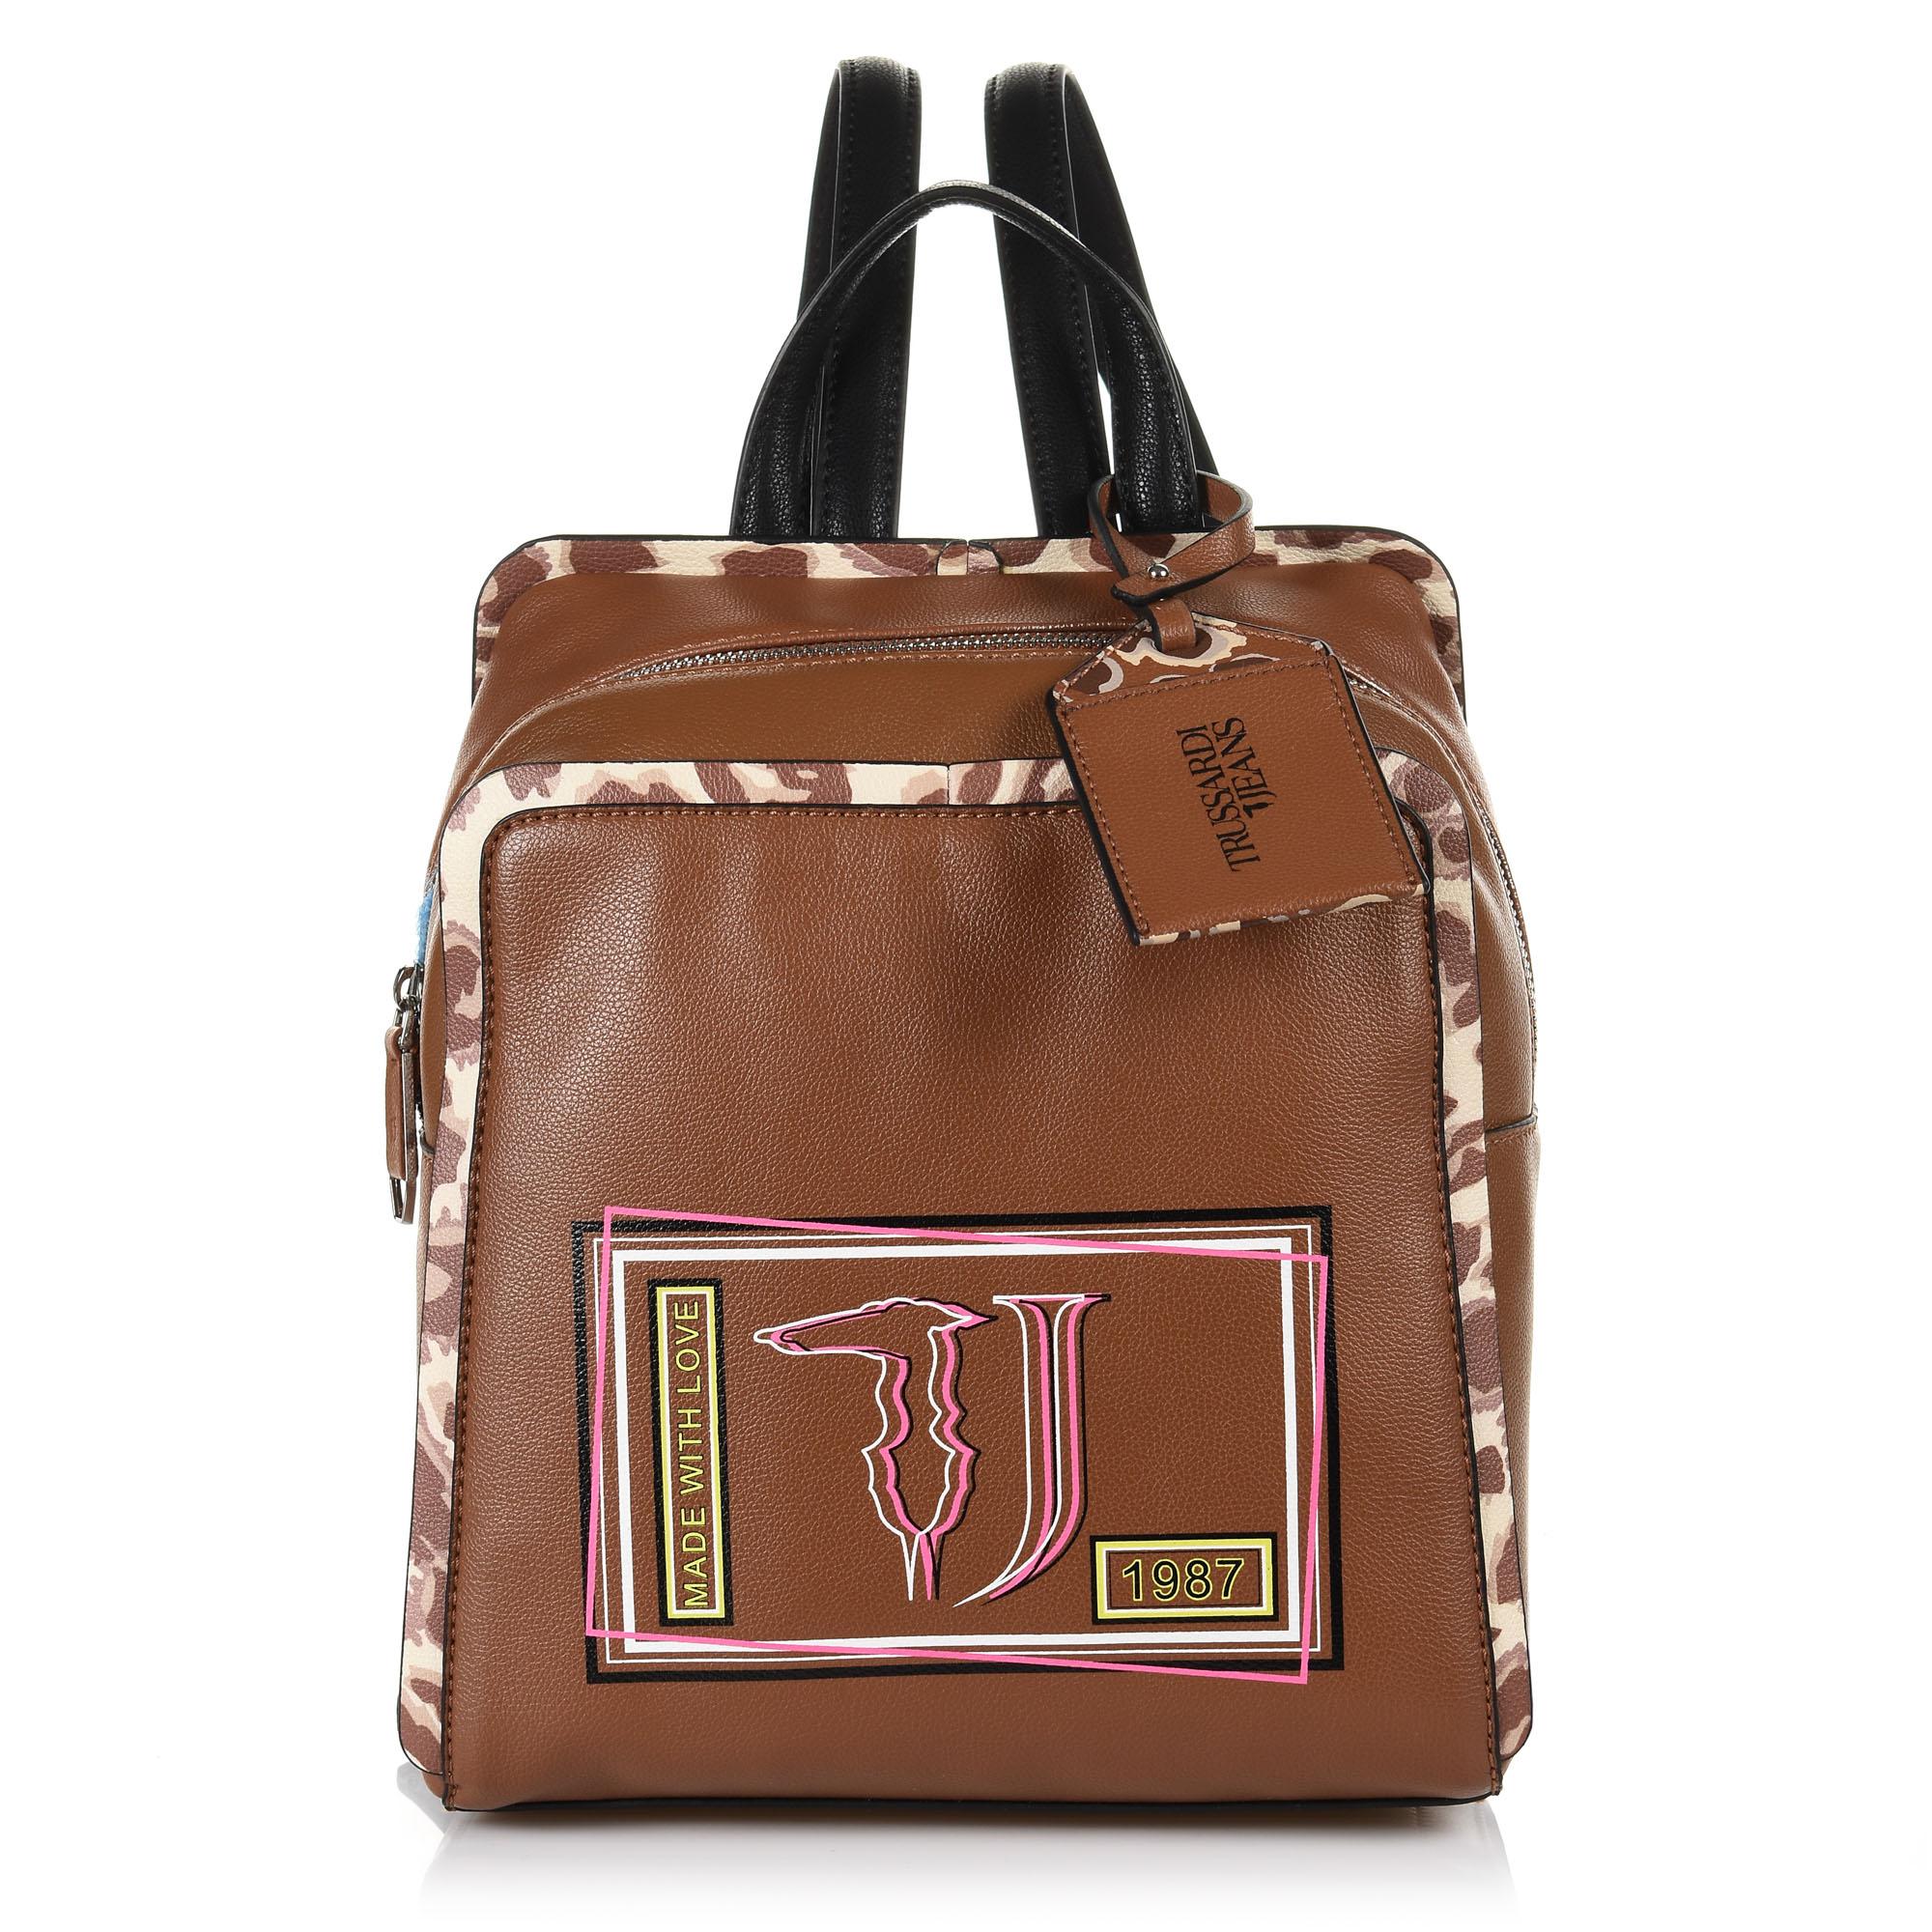 26dfee2cd7 Σακίδιο Πλάτης Trussardi Jeans Τ-Easy Light Backpack Md Saffiano ...